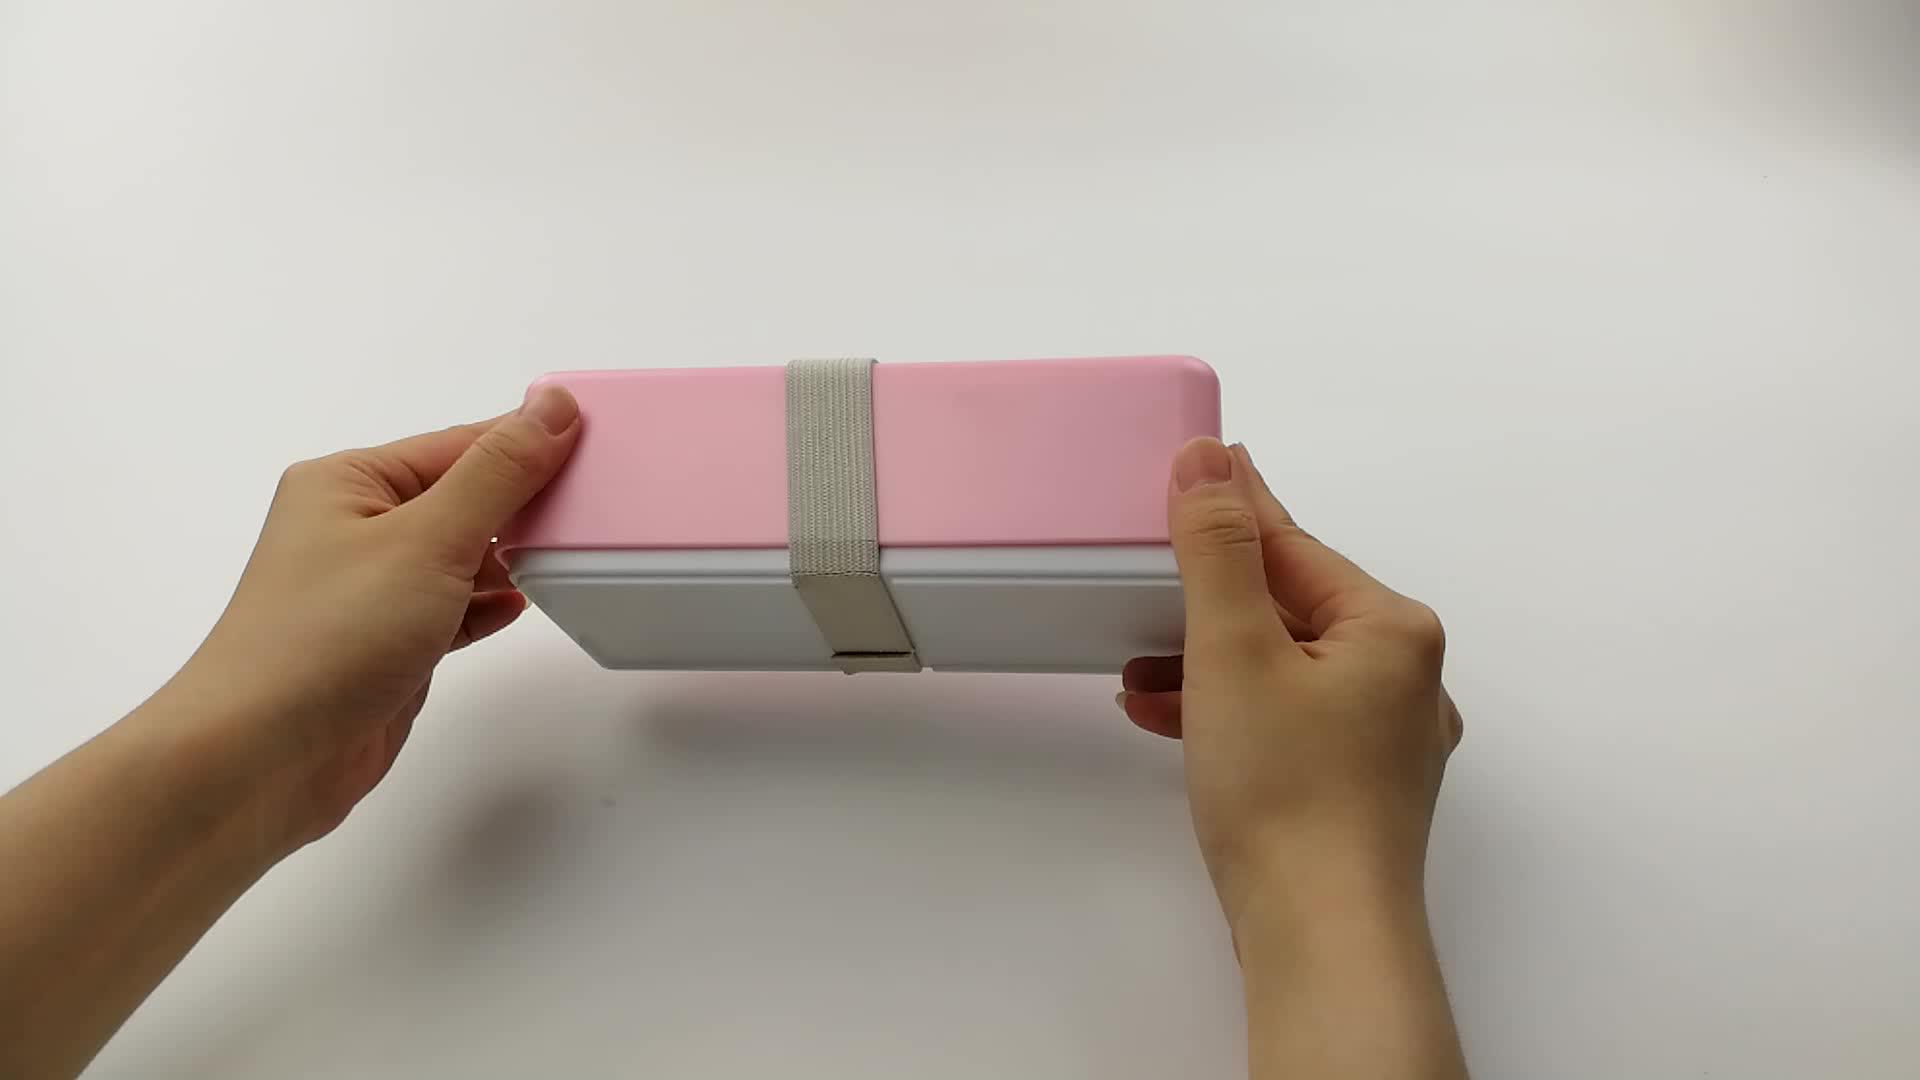 LULA 500 ml doble celosía apilable portátil japonés PP estudiante caja de Bento con tapa para Picnics Camping viaje